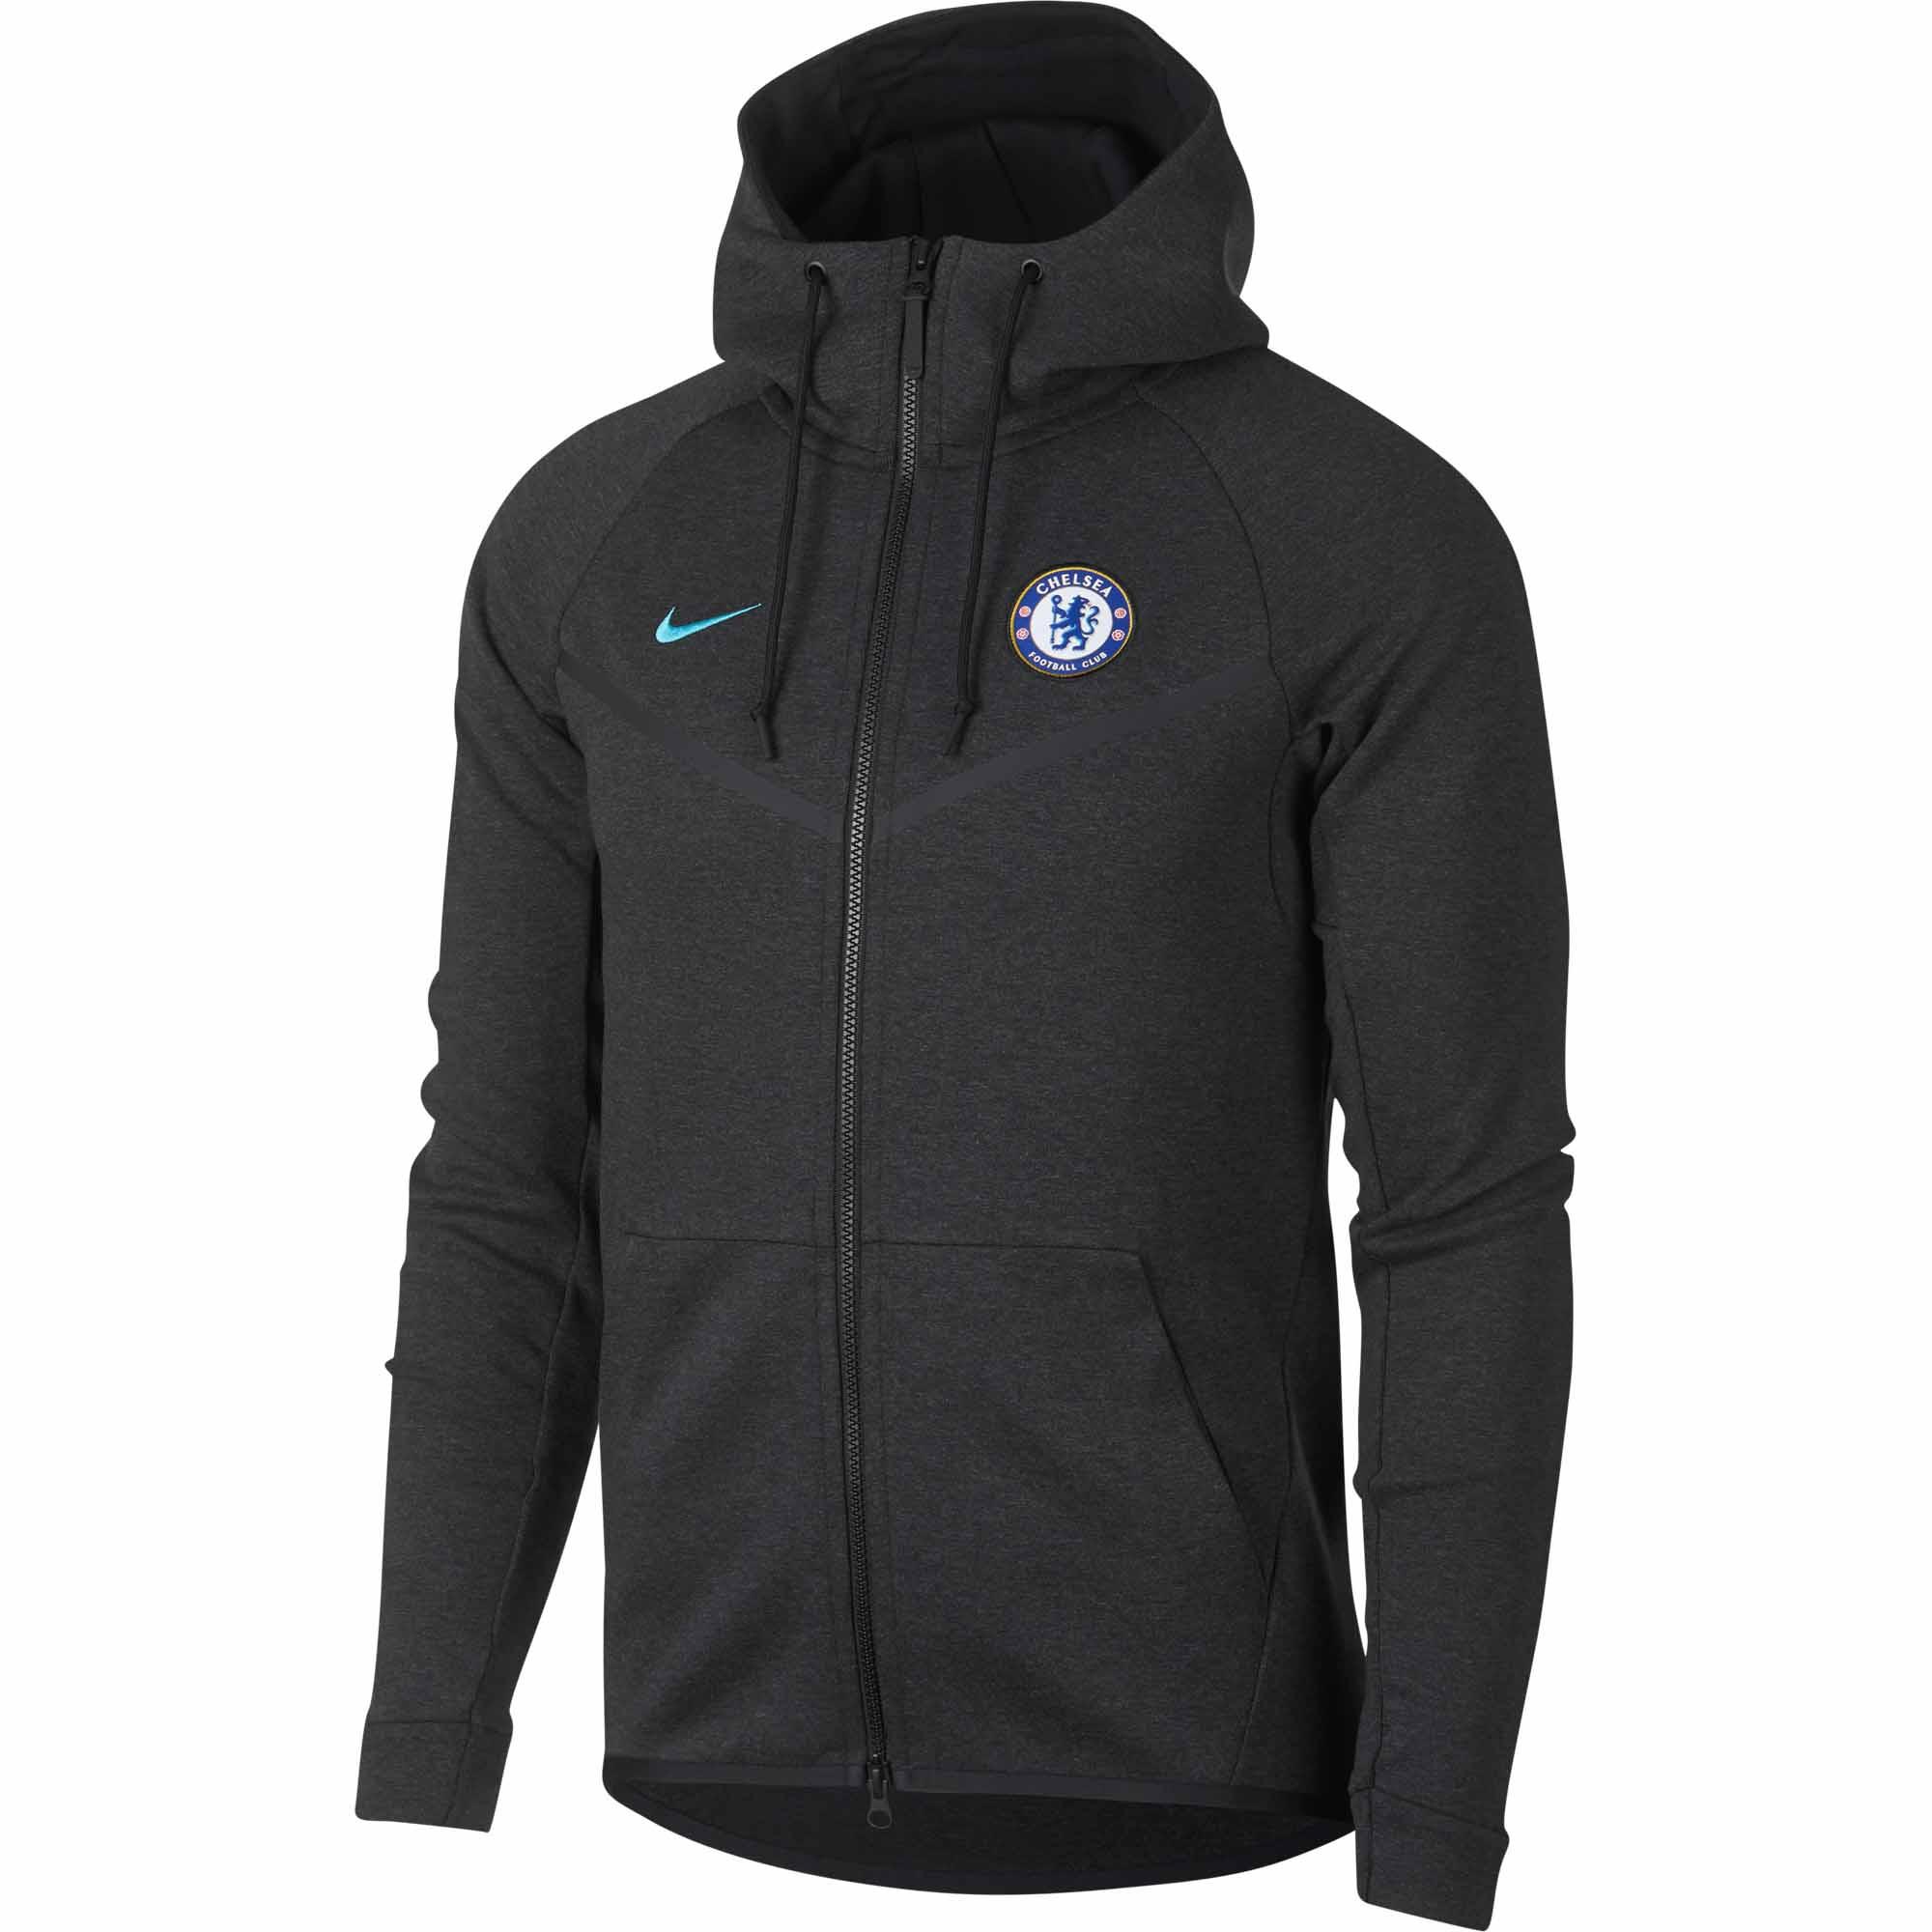 official photos f5170 8ec09 Nike Chelsea Tech Fleece Windrunner Jacket – Black Heather/Omega Blue